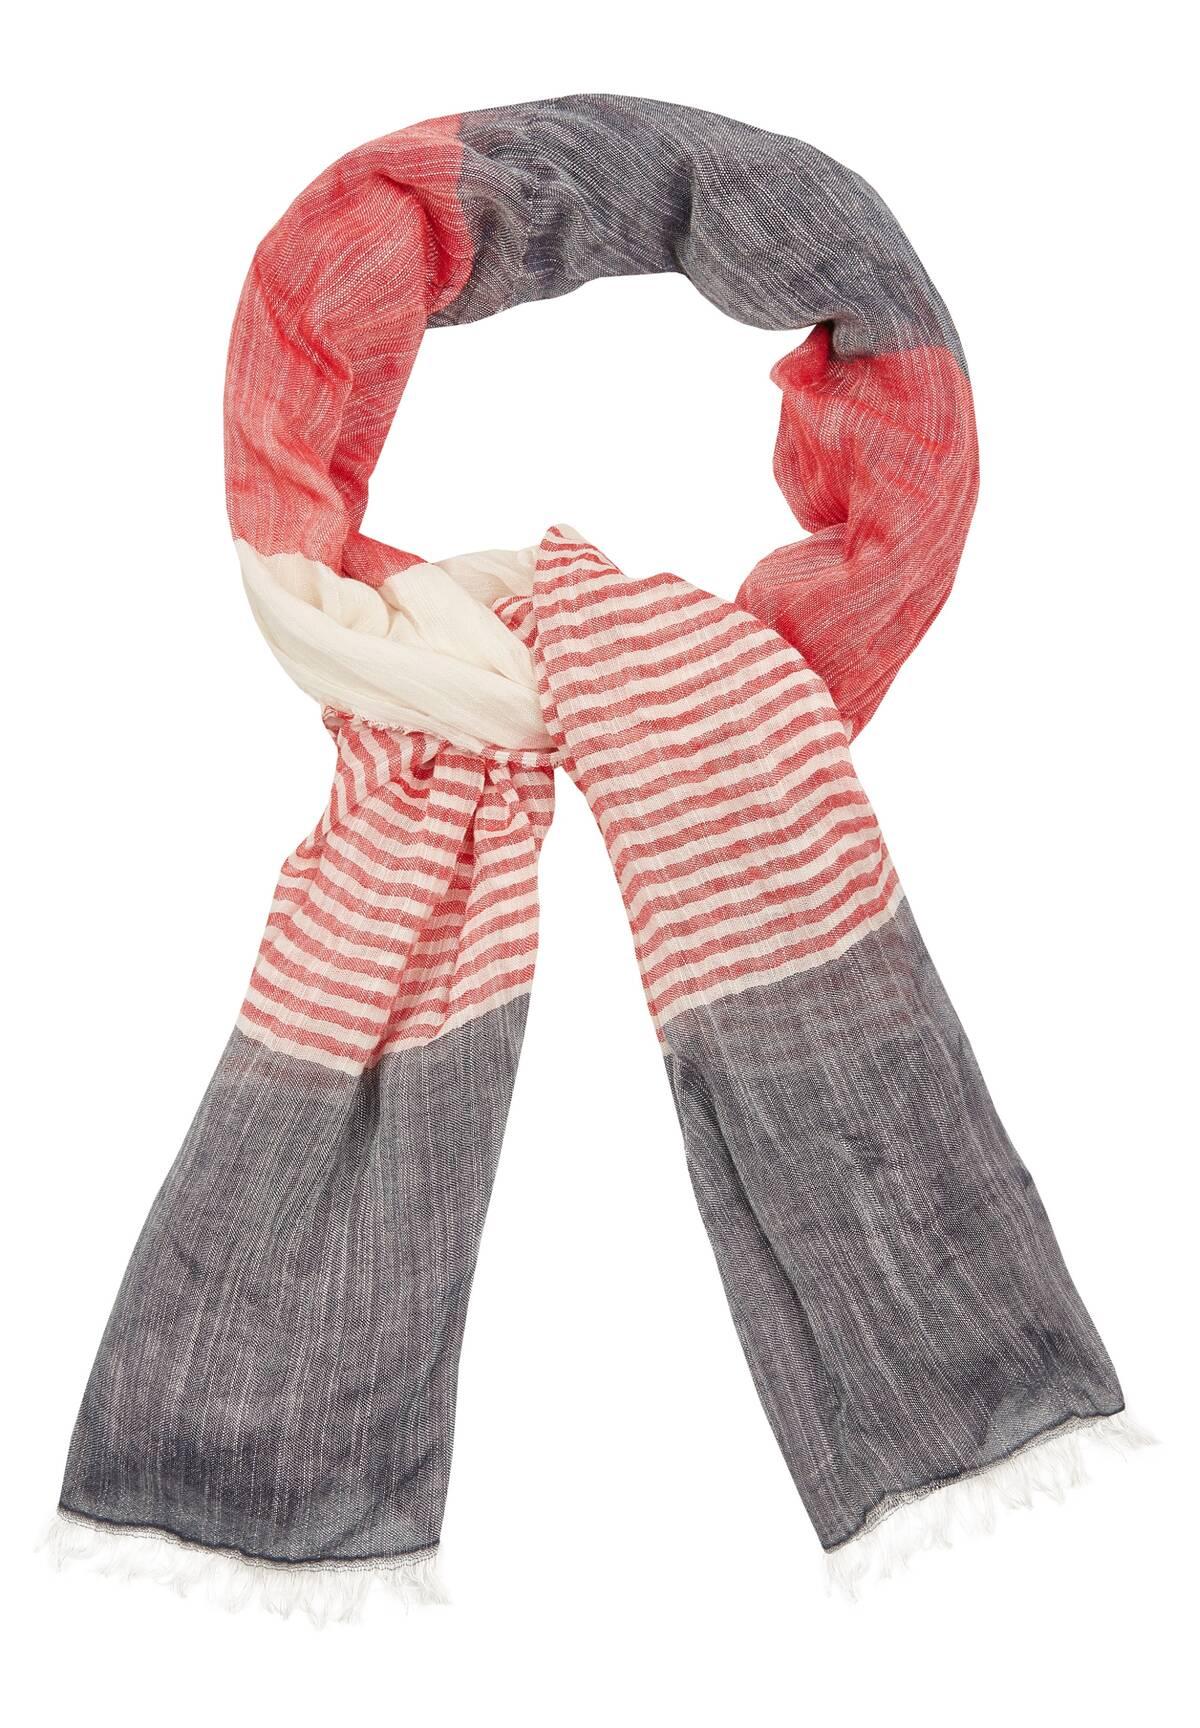 Silvoller Schal in Kontrastfarben / Stripy Scarf